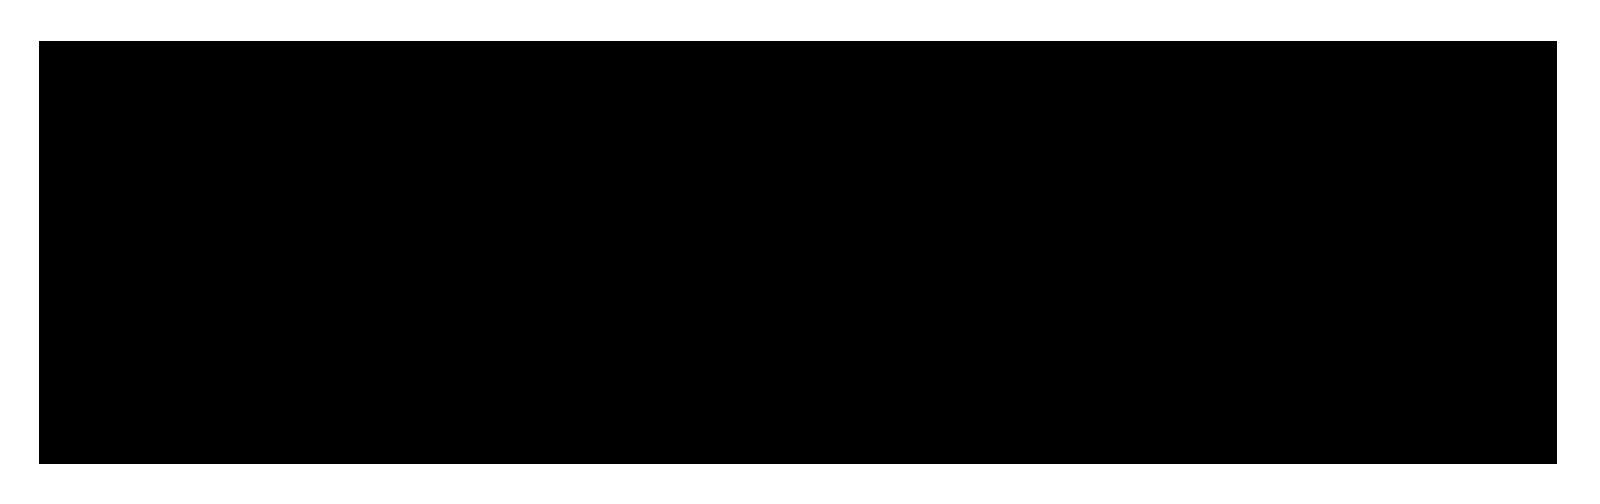 Logotipo-Click-for-Festivals negr